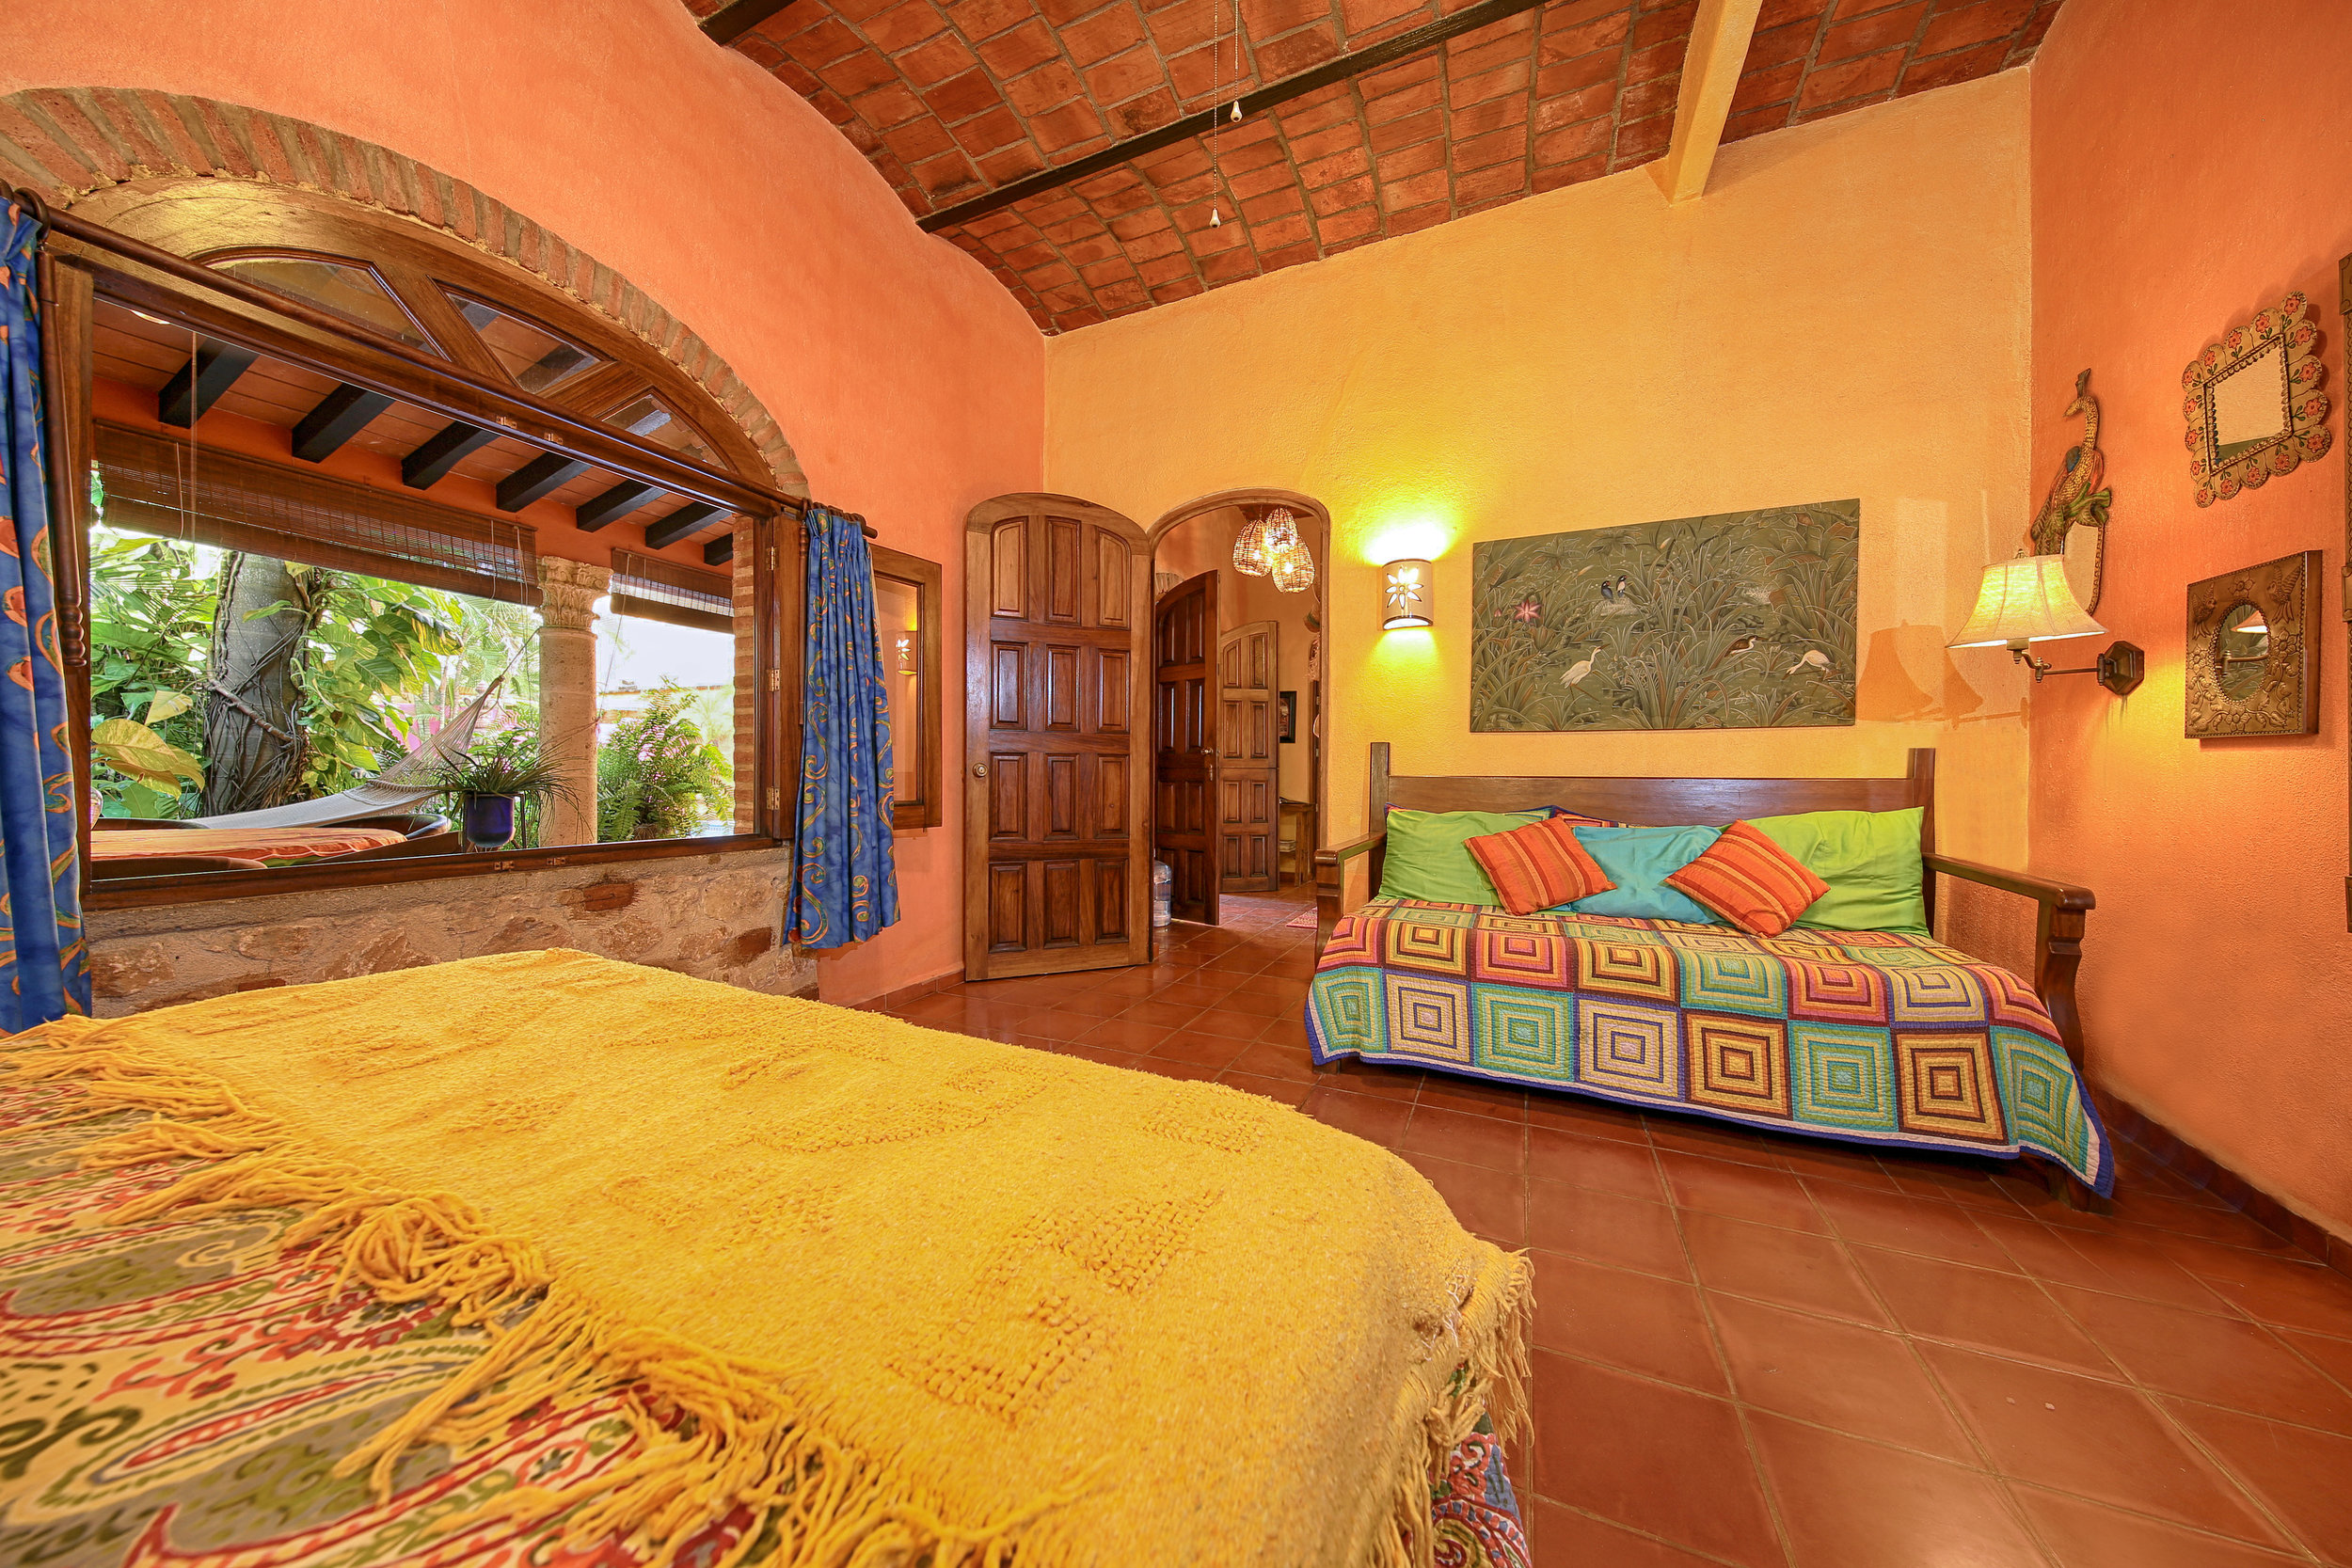 Casa_Sorpresa_Sayulita_Mexico_Dorsett_Photography_(22).jpg